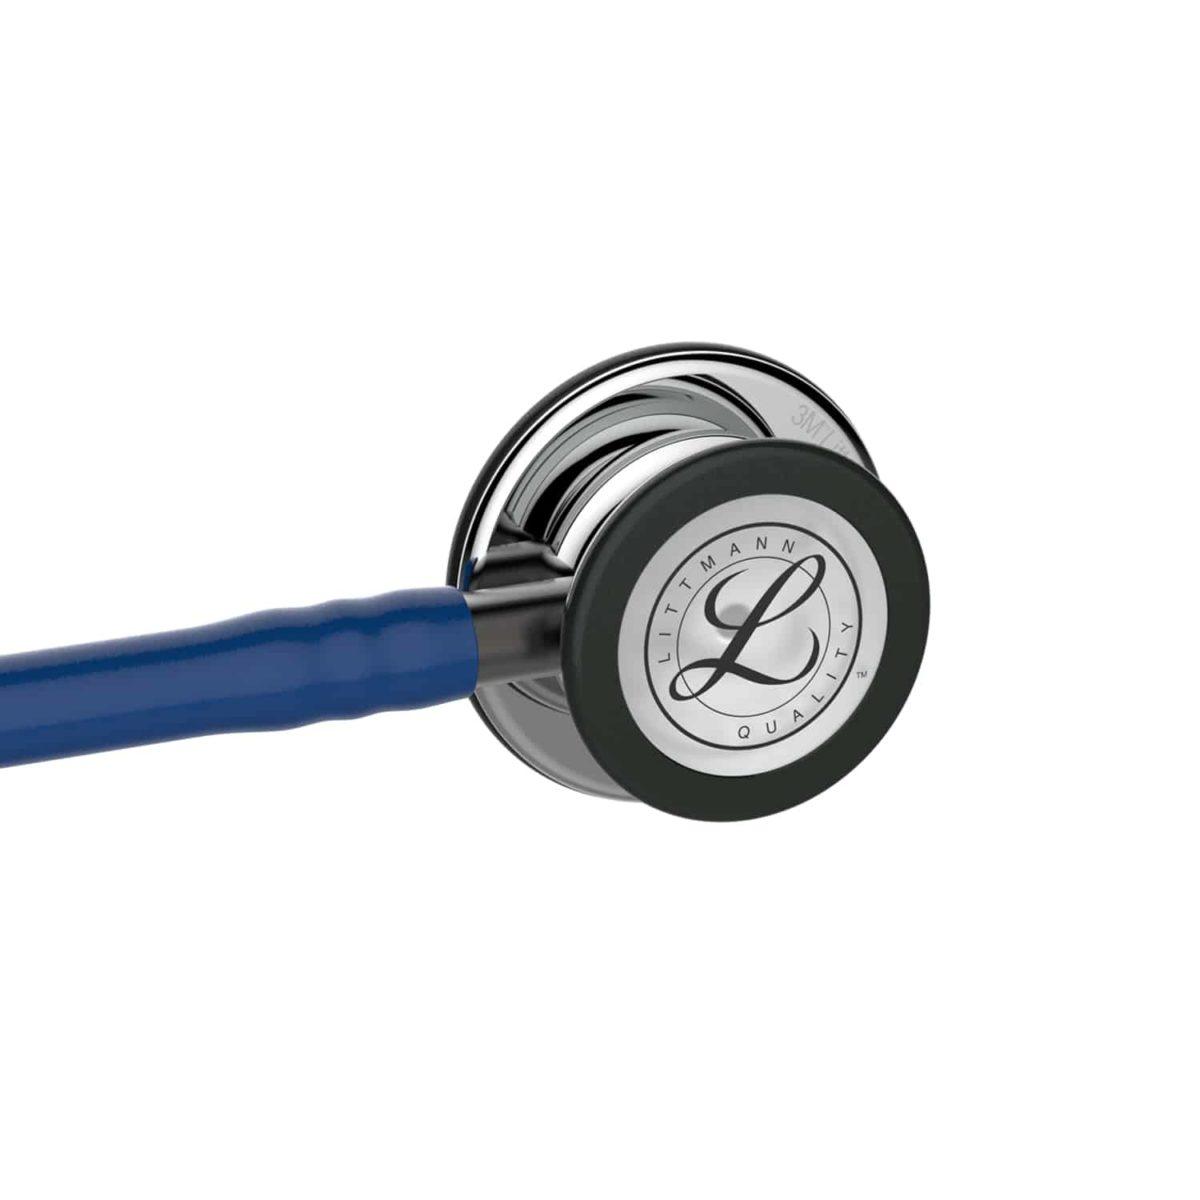 3M Littmann Classic III Stethoscope Navy & Mirror 5